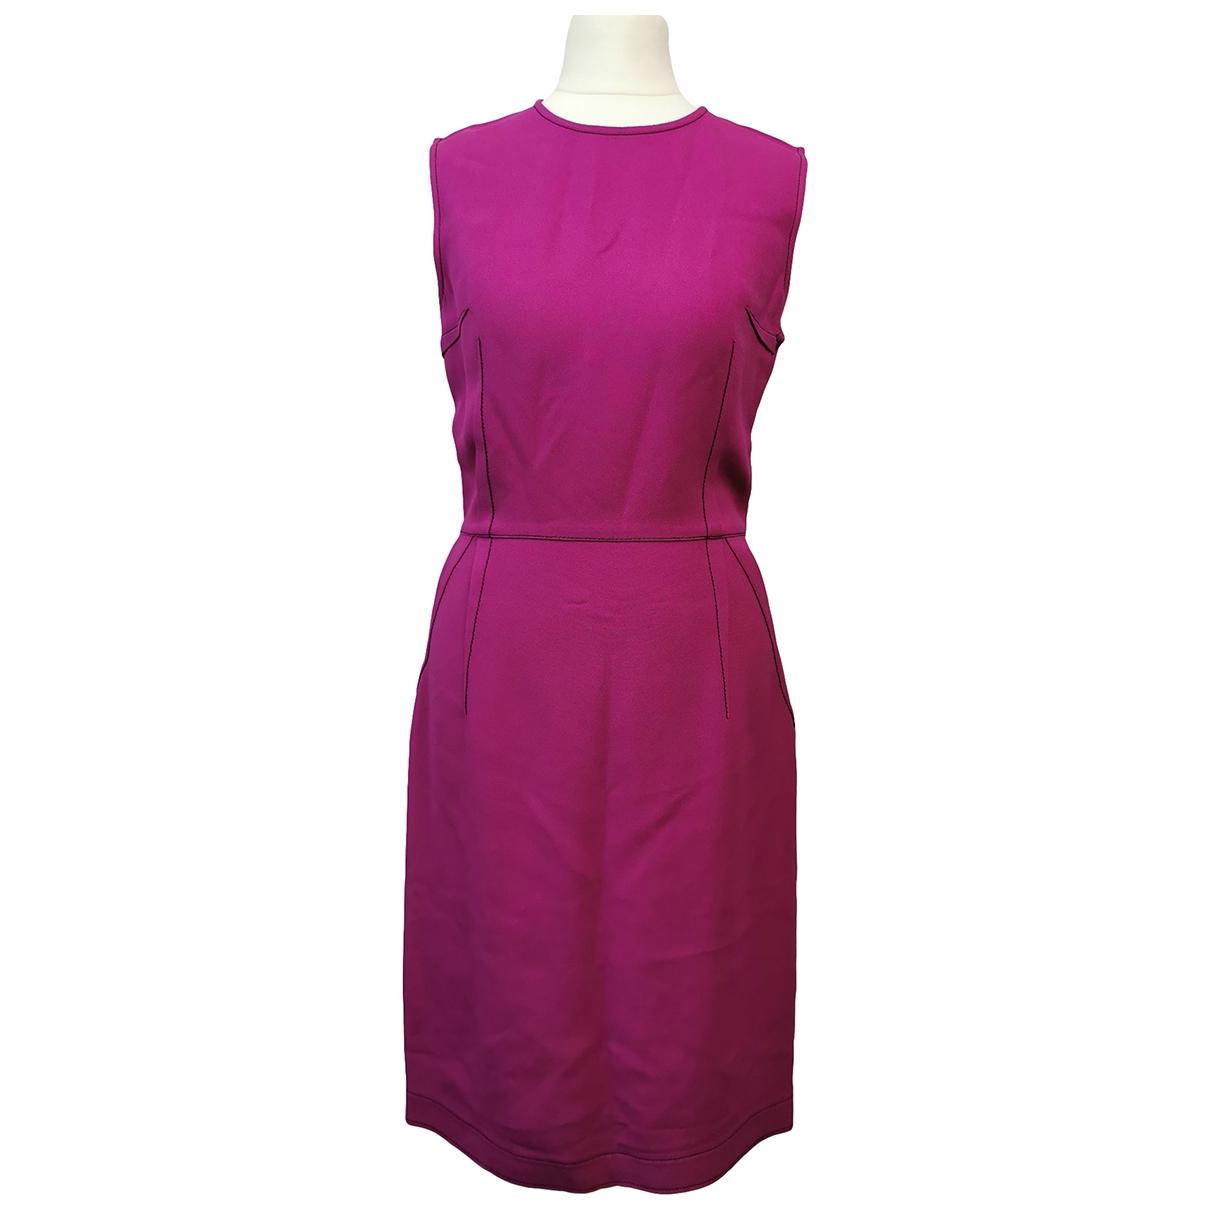 Lanvin \N Kleid in  Rosa Synthetik